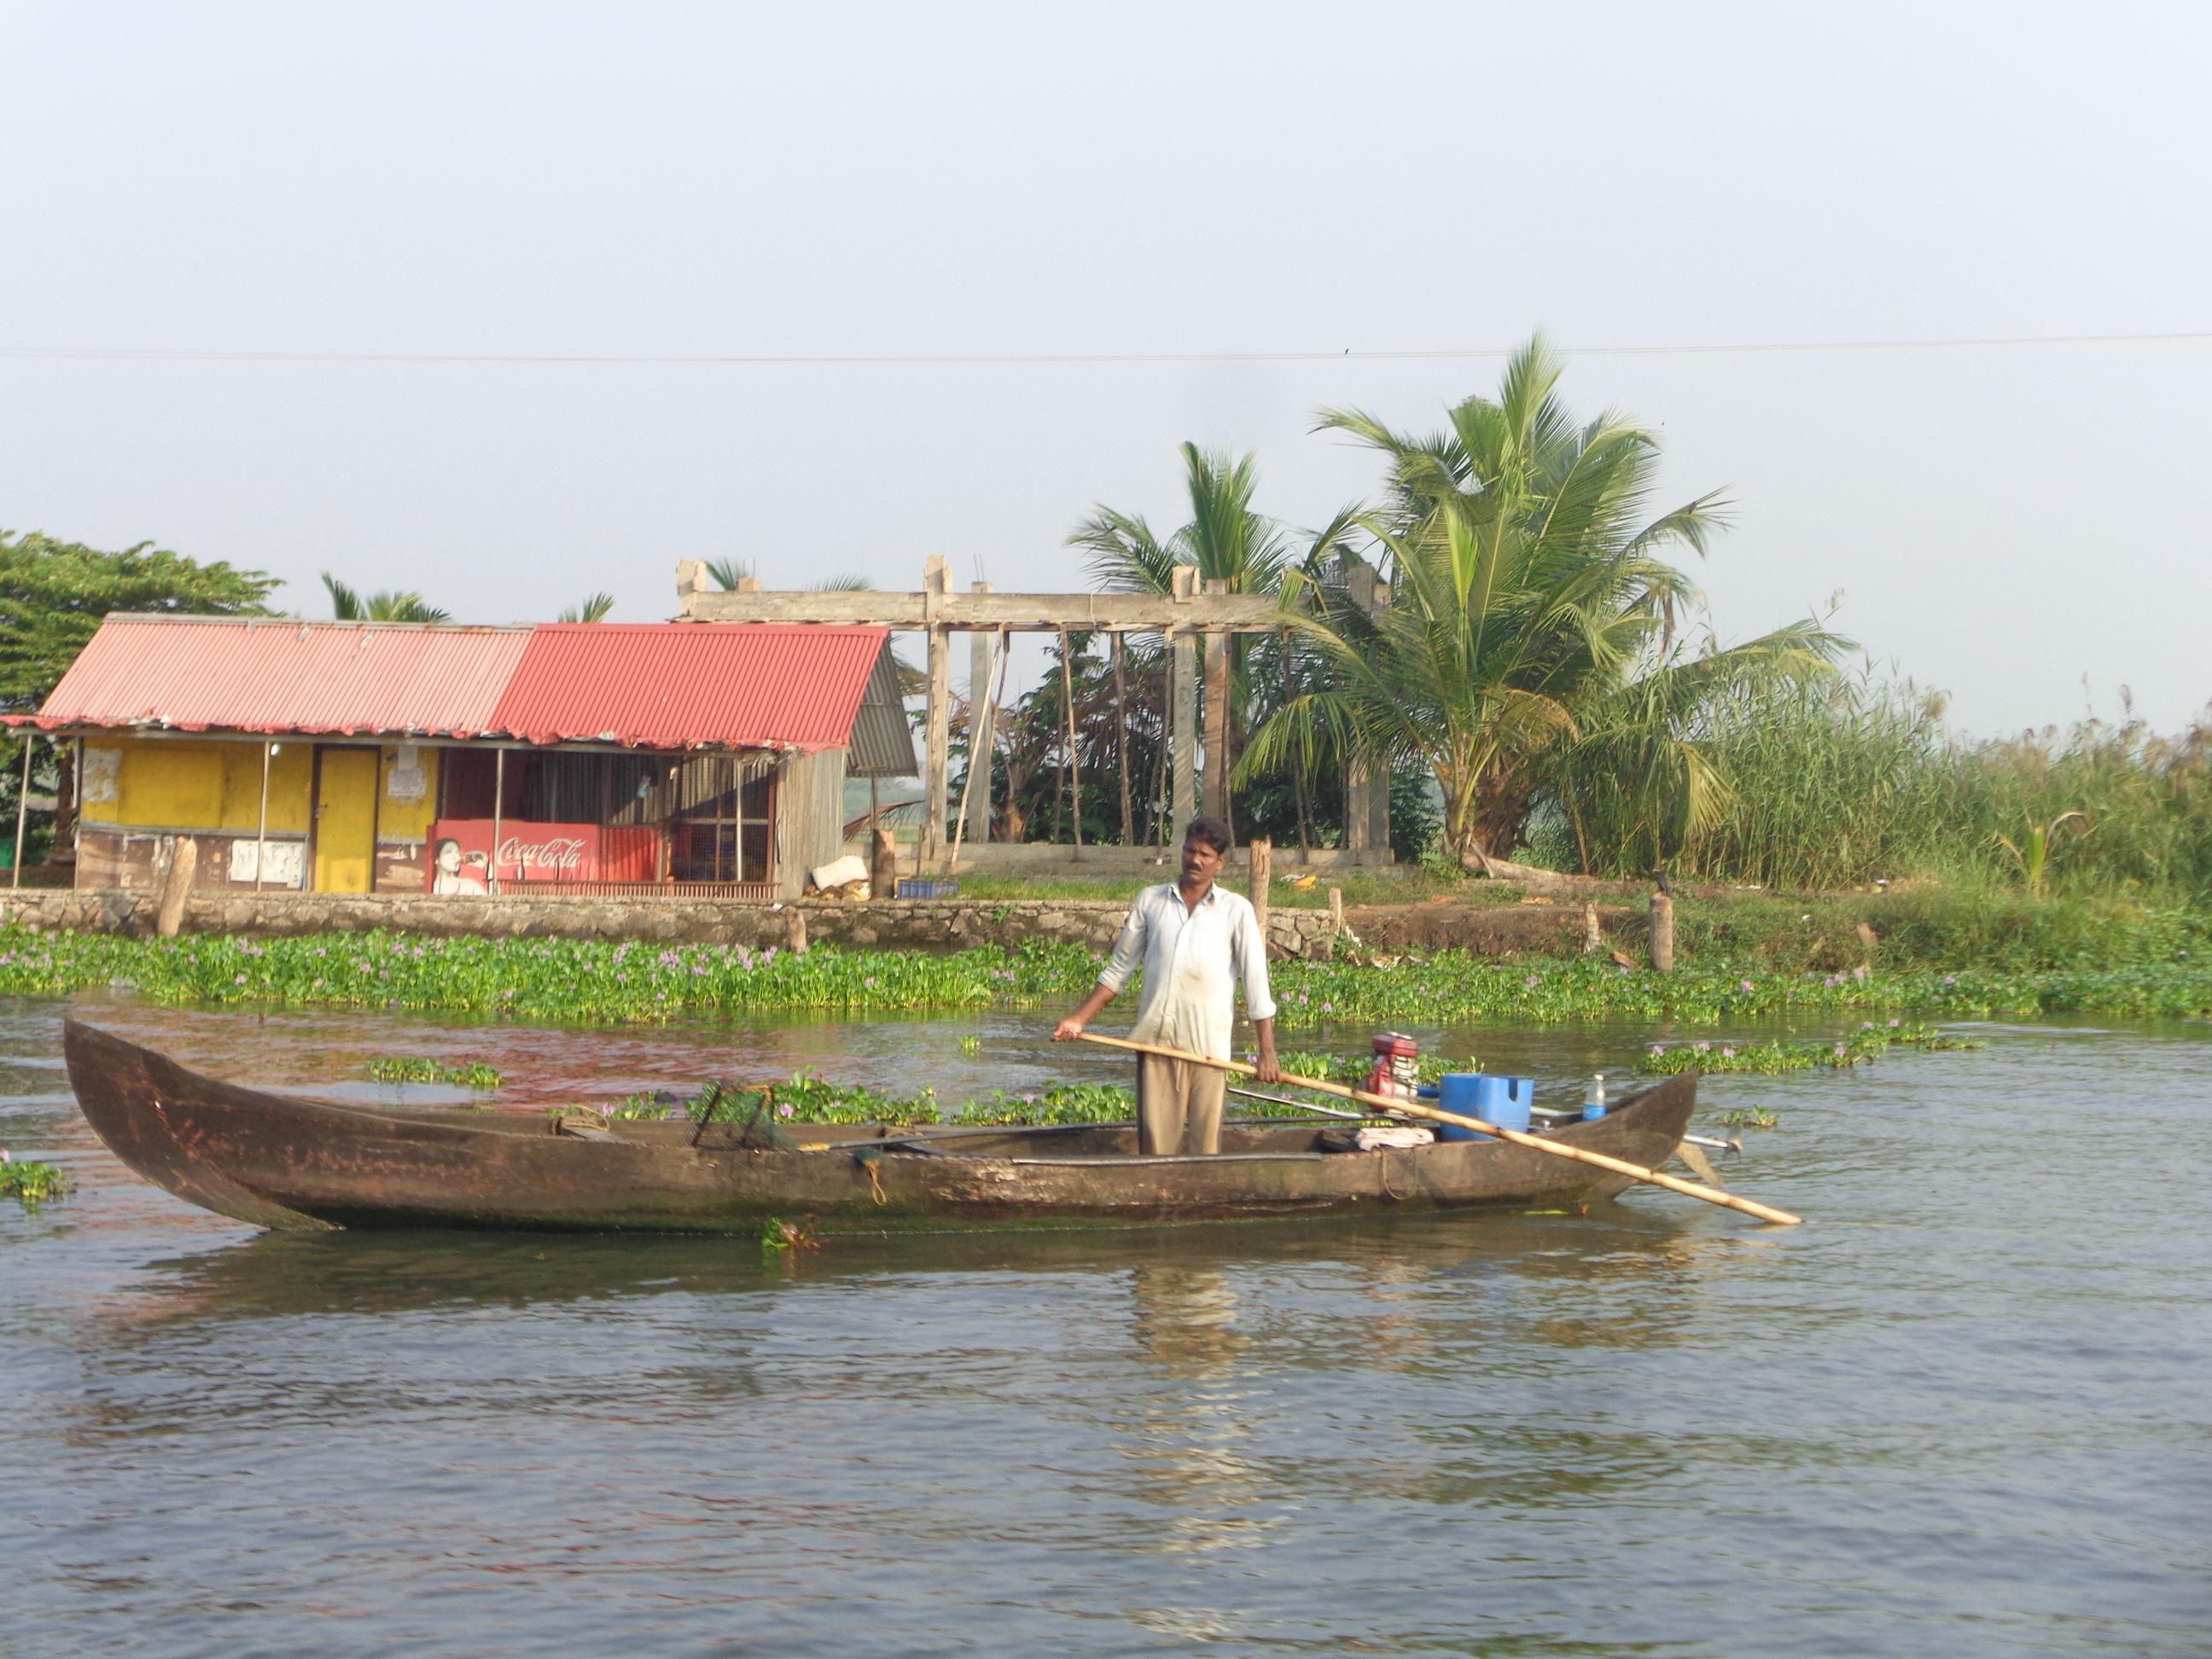 Sites de rencontres à Kottayam